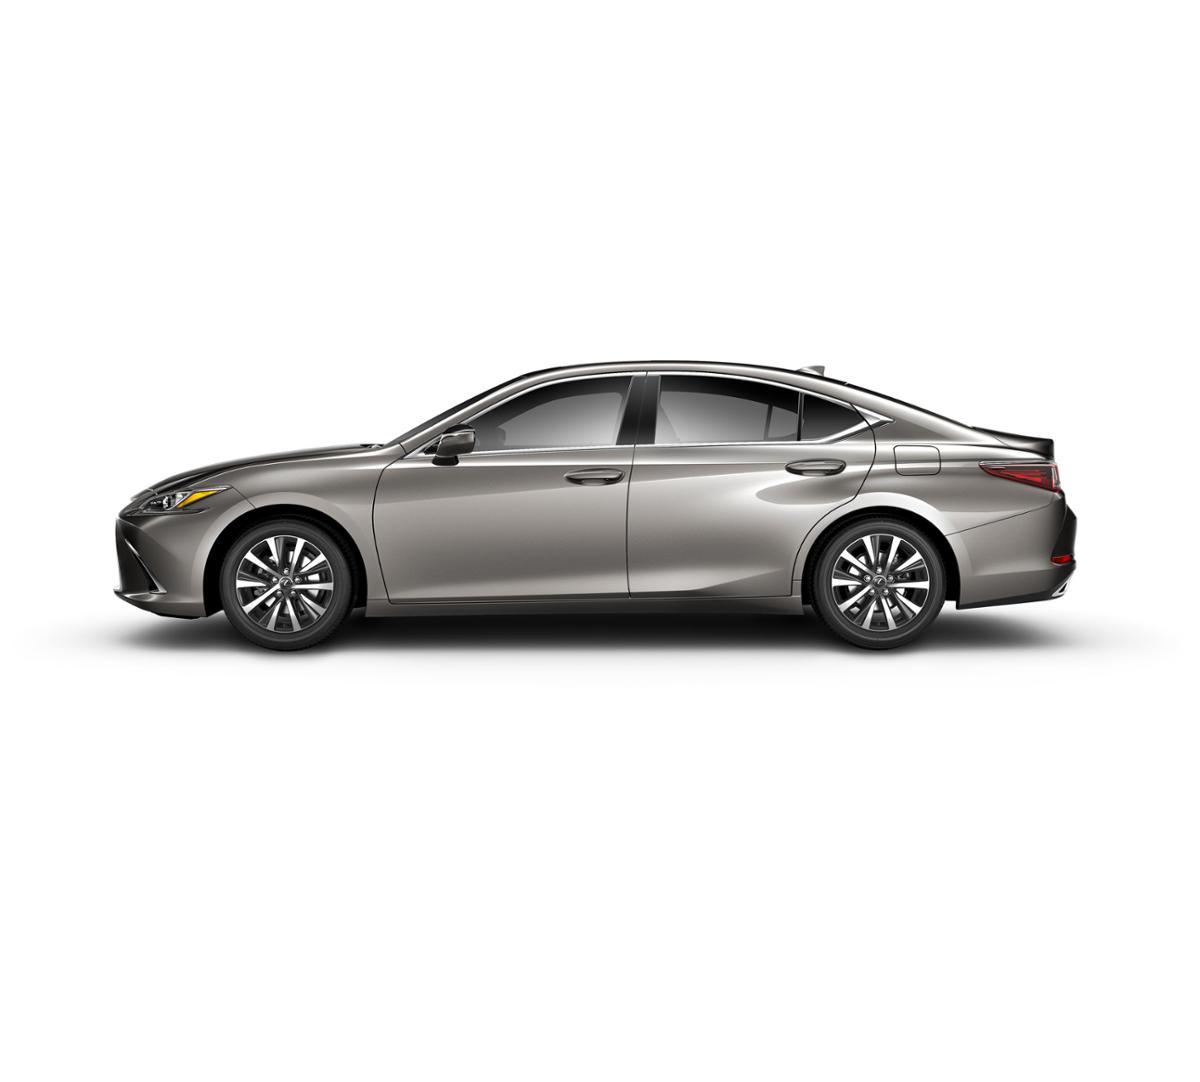 2019 Atomic Silver Lexus ES 350 For Sale In San Rafael